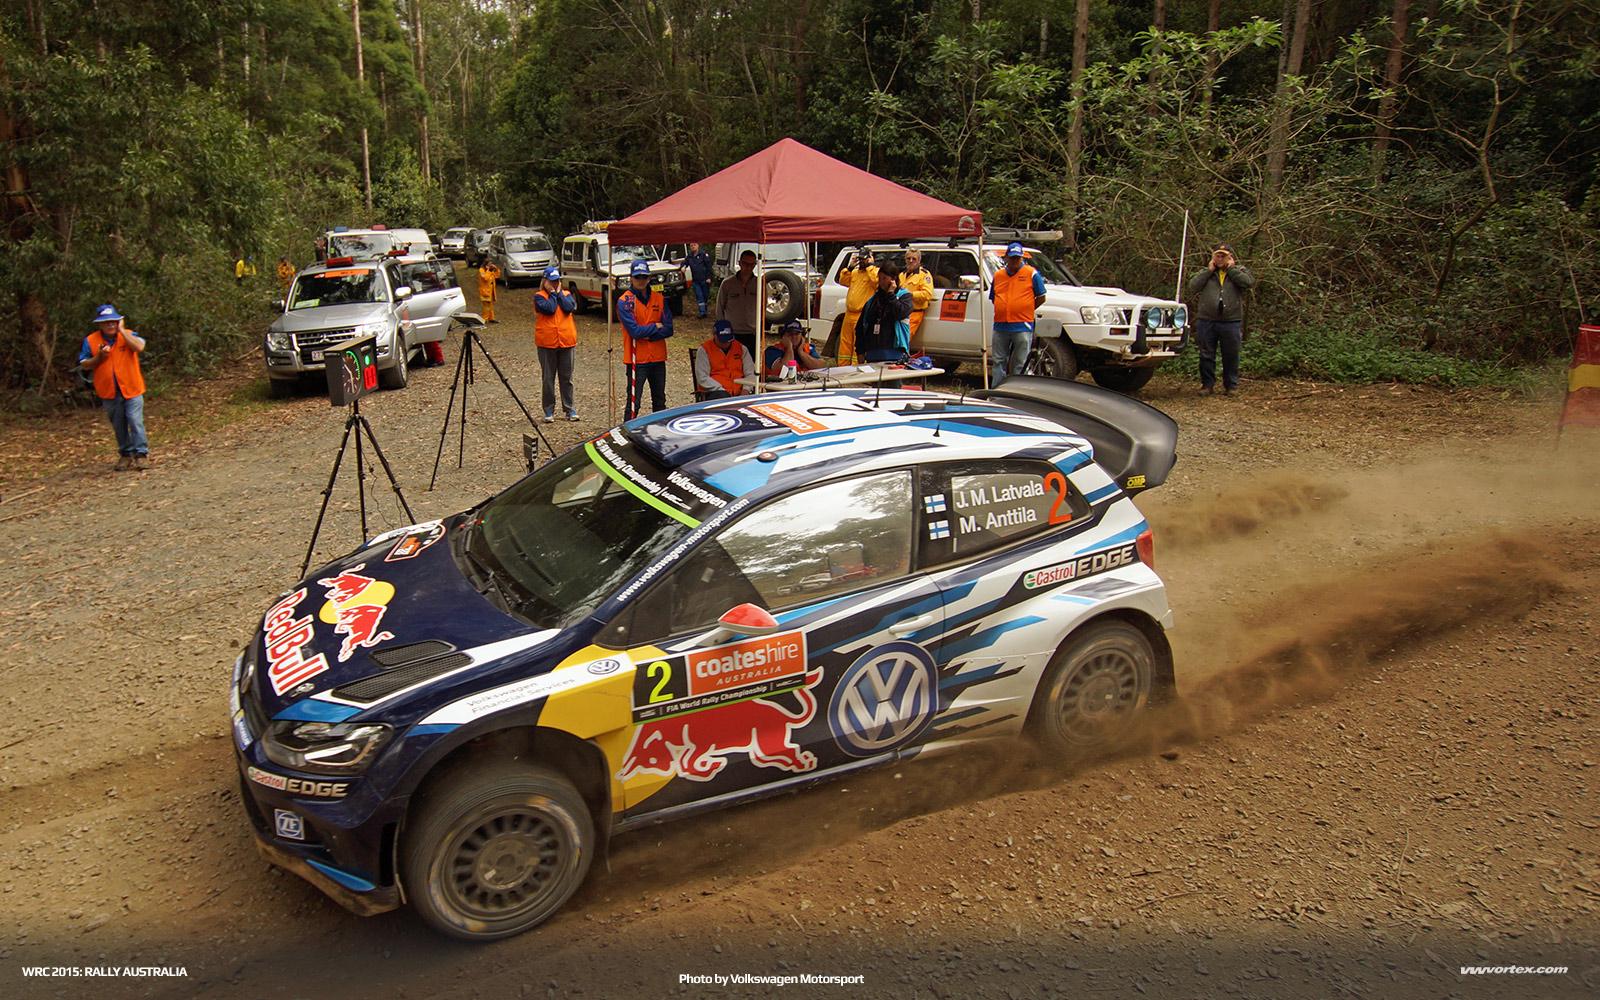 wrc-2015-rally-australia-421